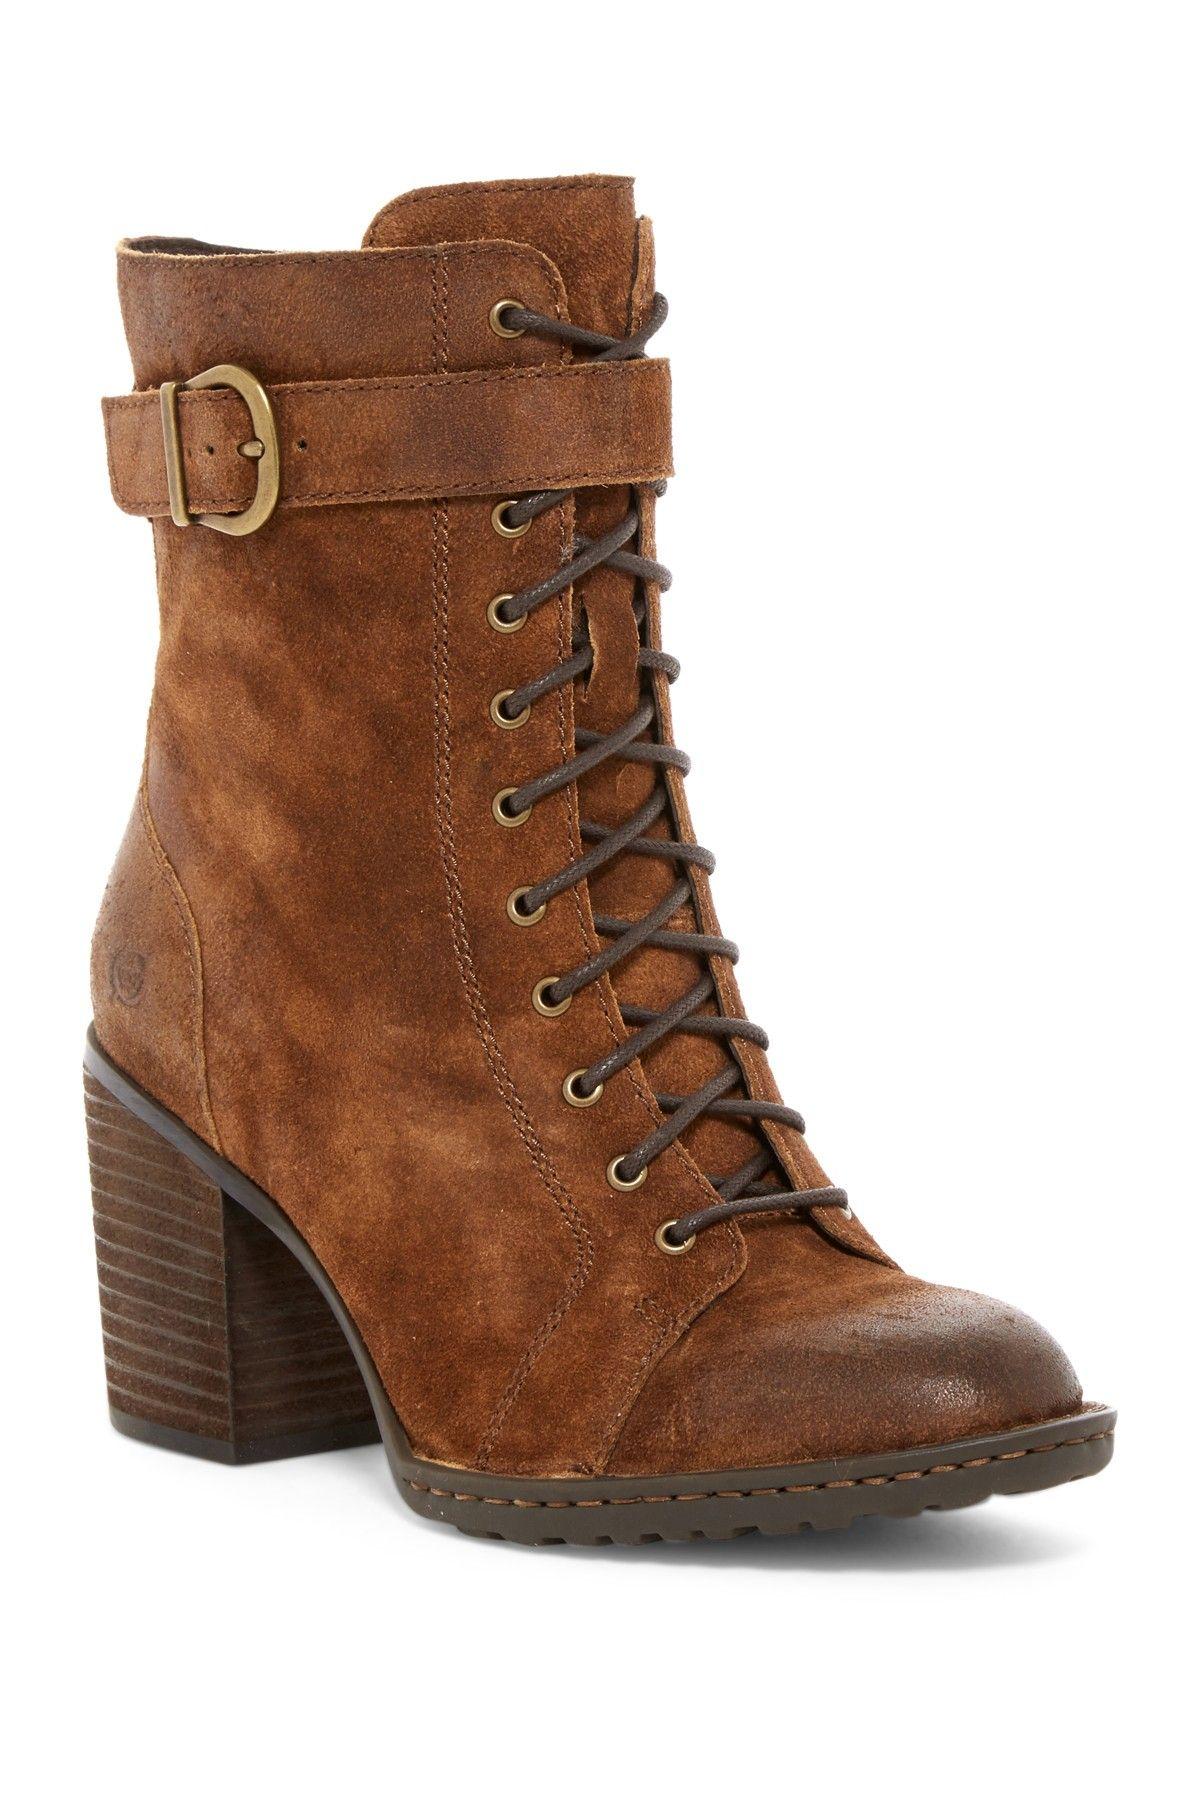 4b102d01f2255 Cass Block Heel Boot by Born on  nordstrom rack